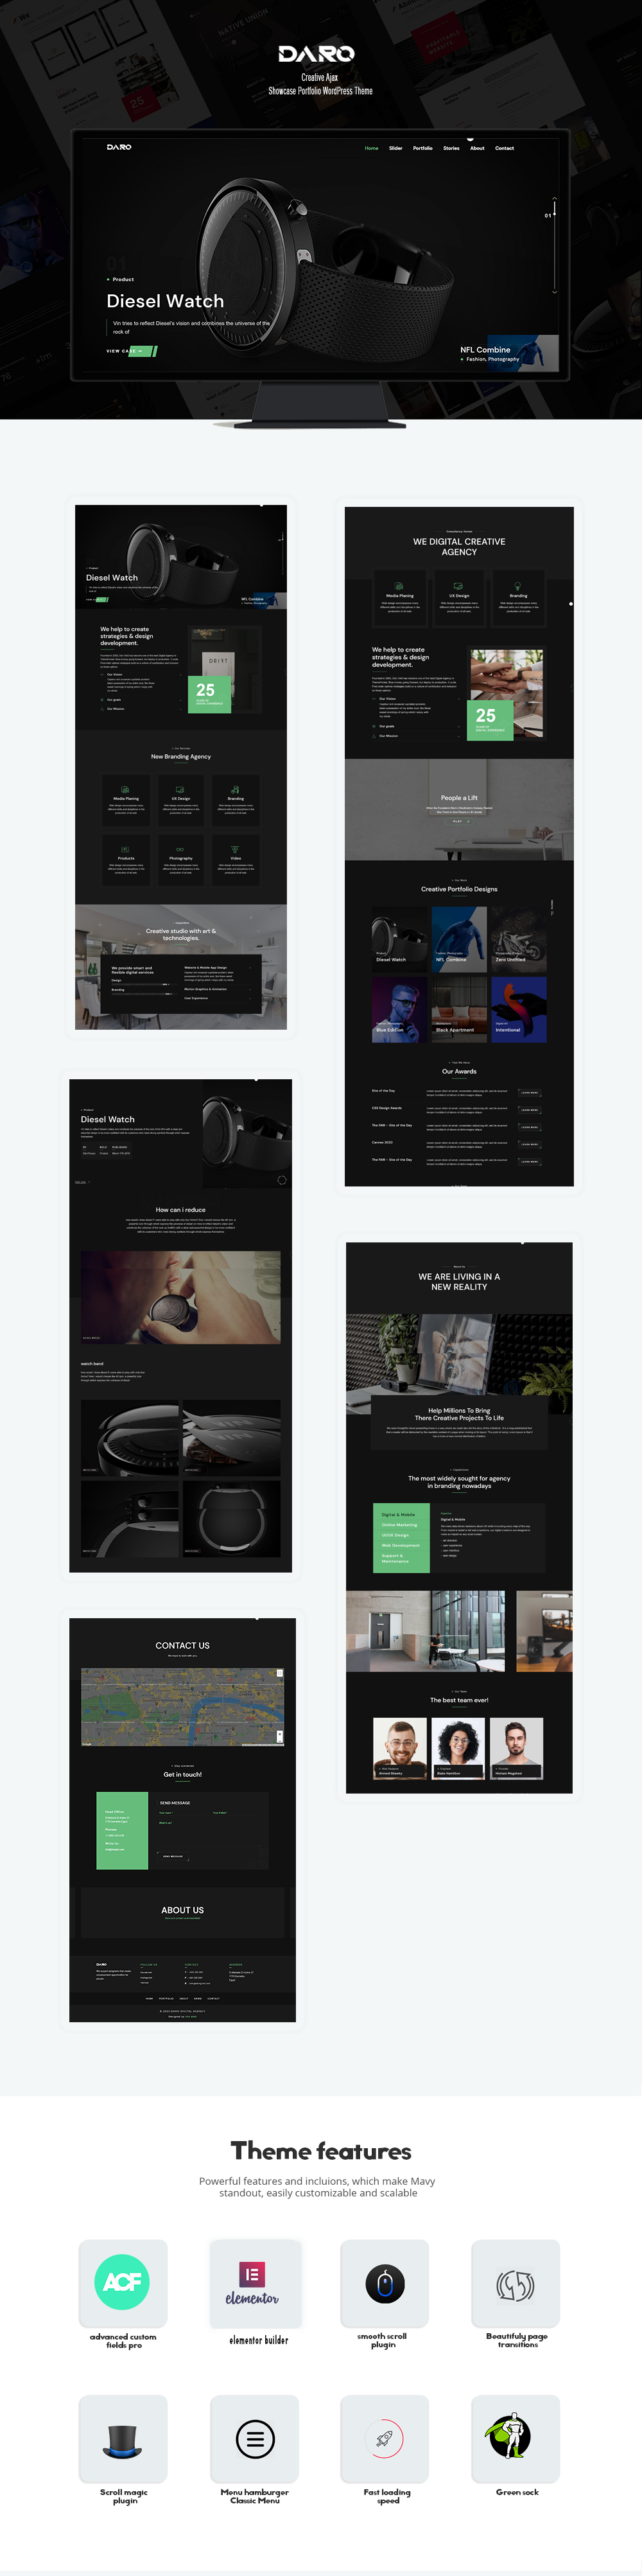 Daro - Thème WordPress Ajax Portfolio - 1